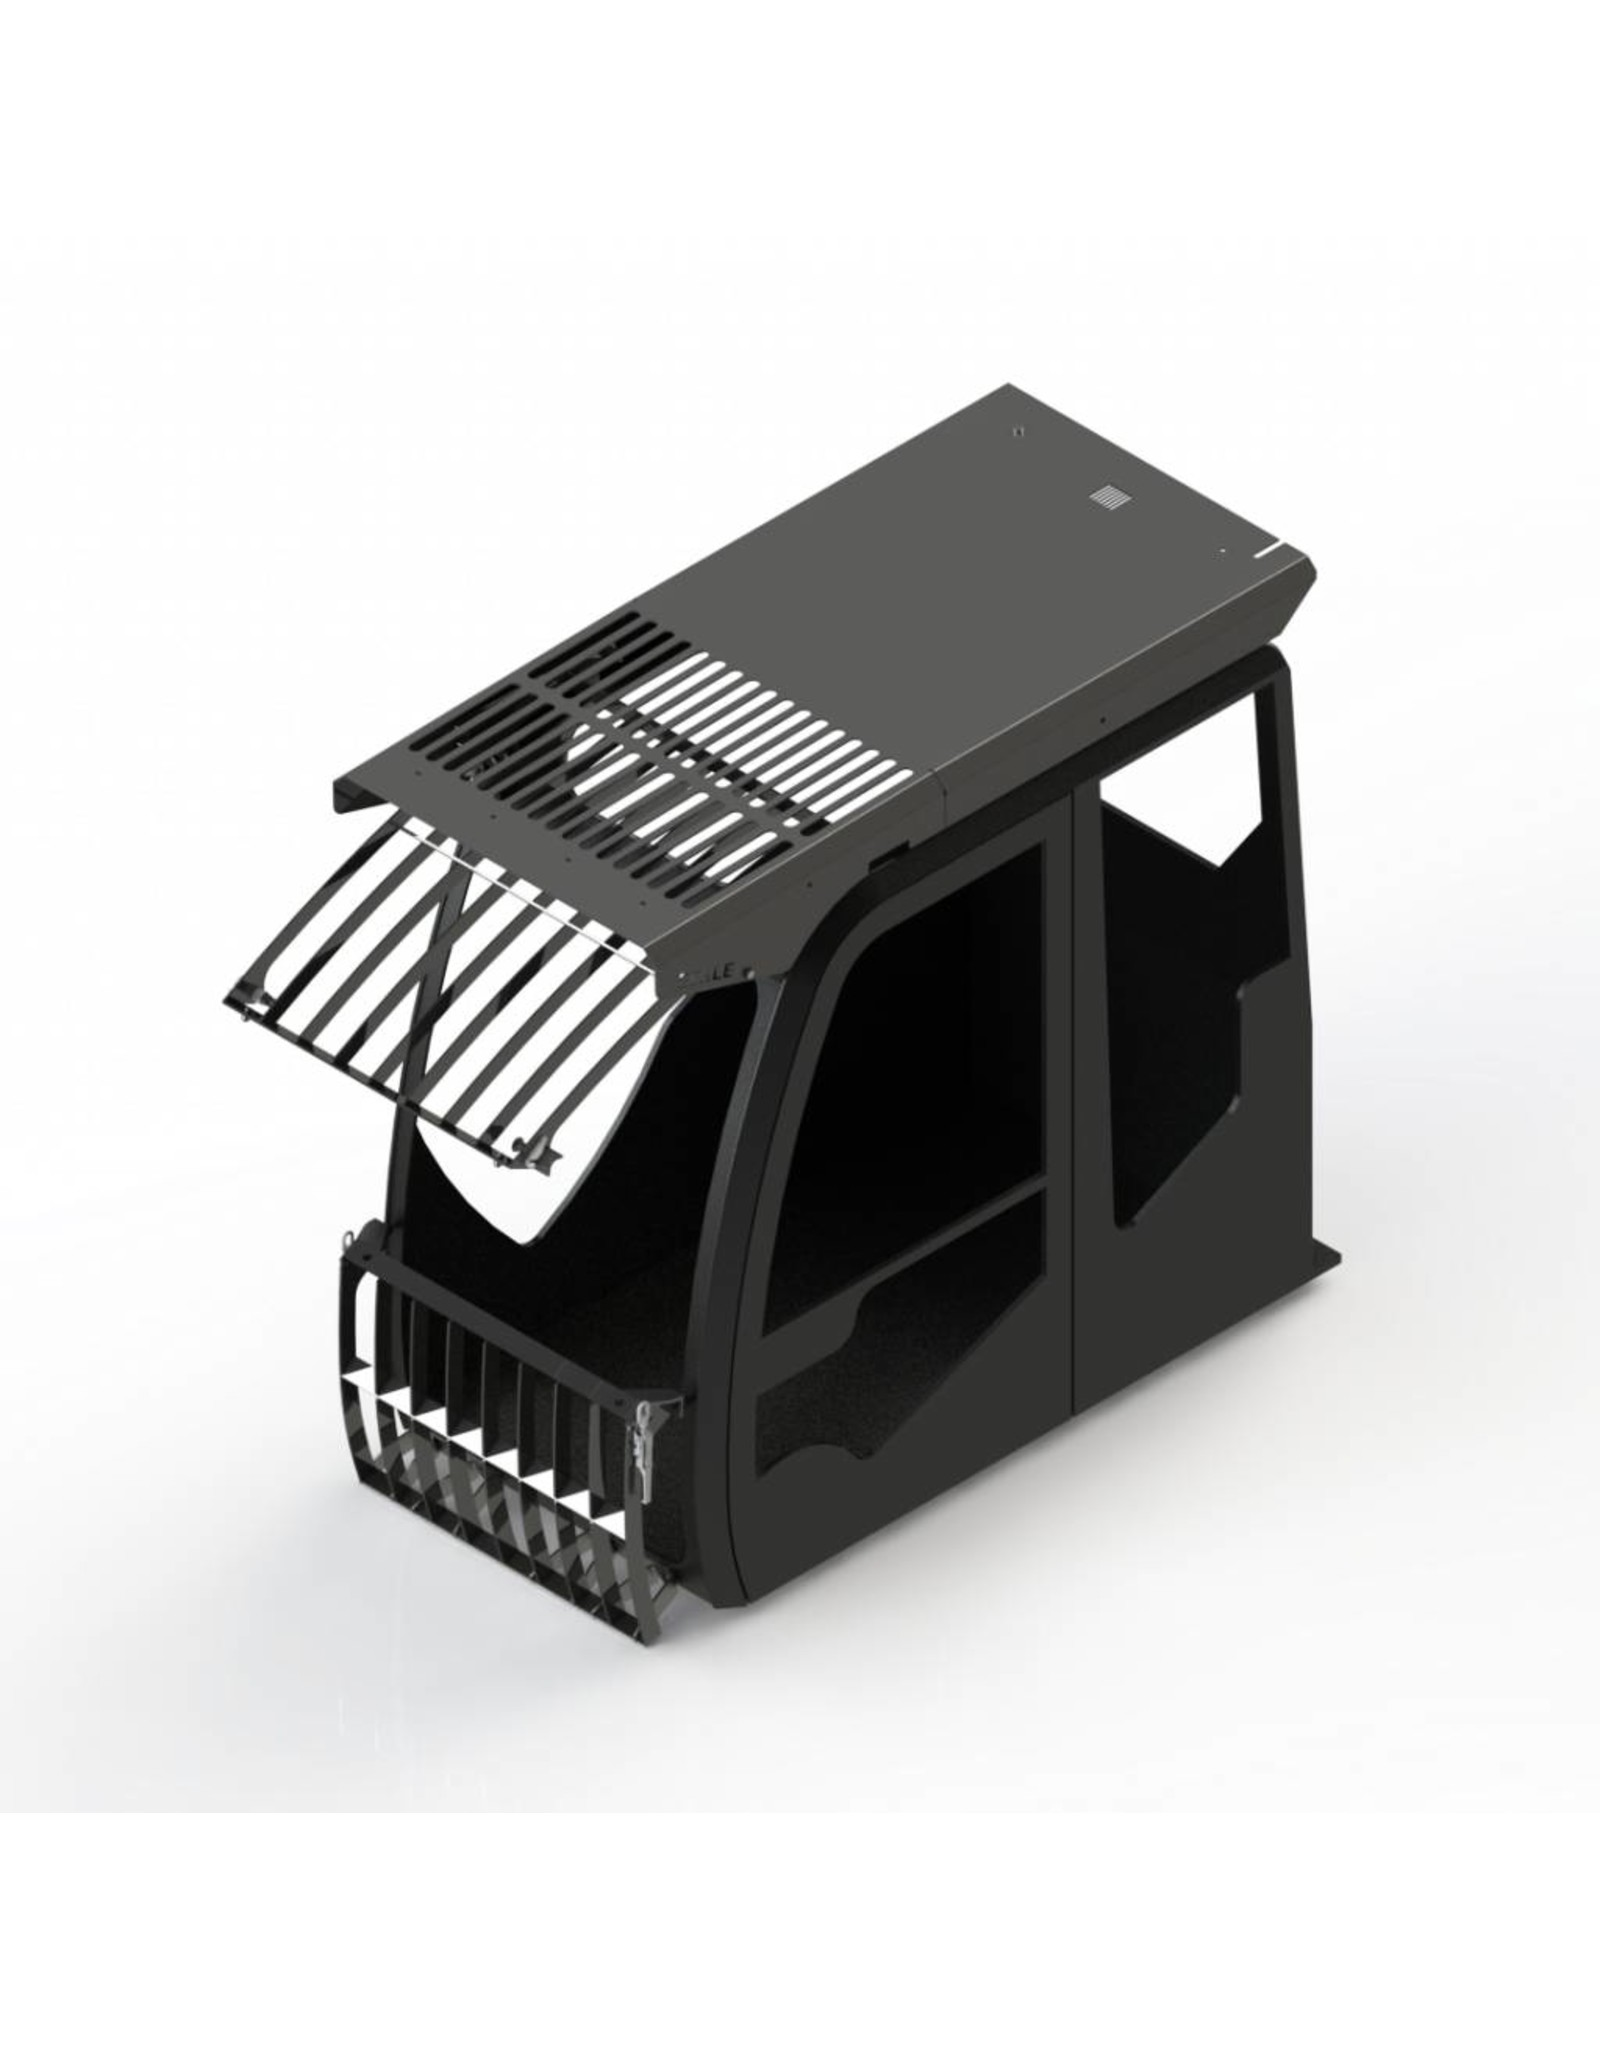 Echle Hartstahl GmbH FOPS pour Komatsu HB215LC-3 Hybrid